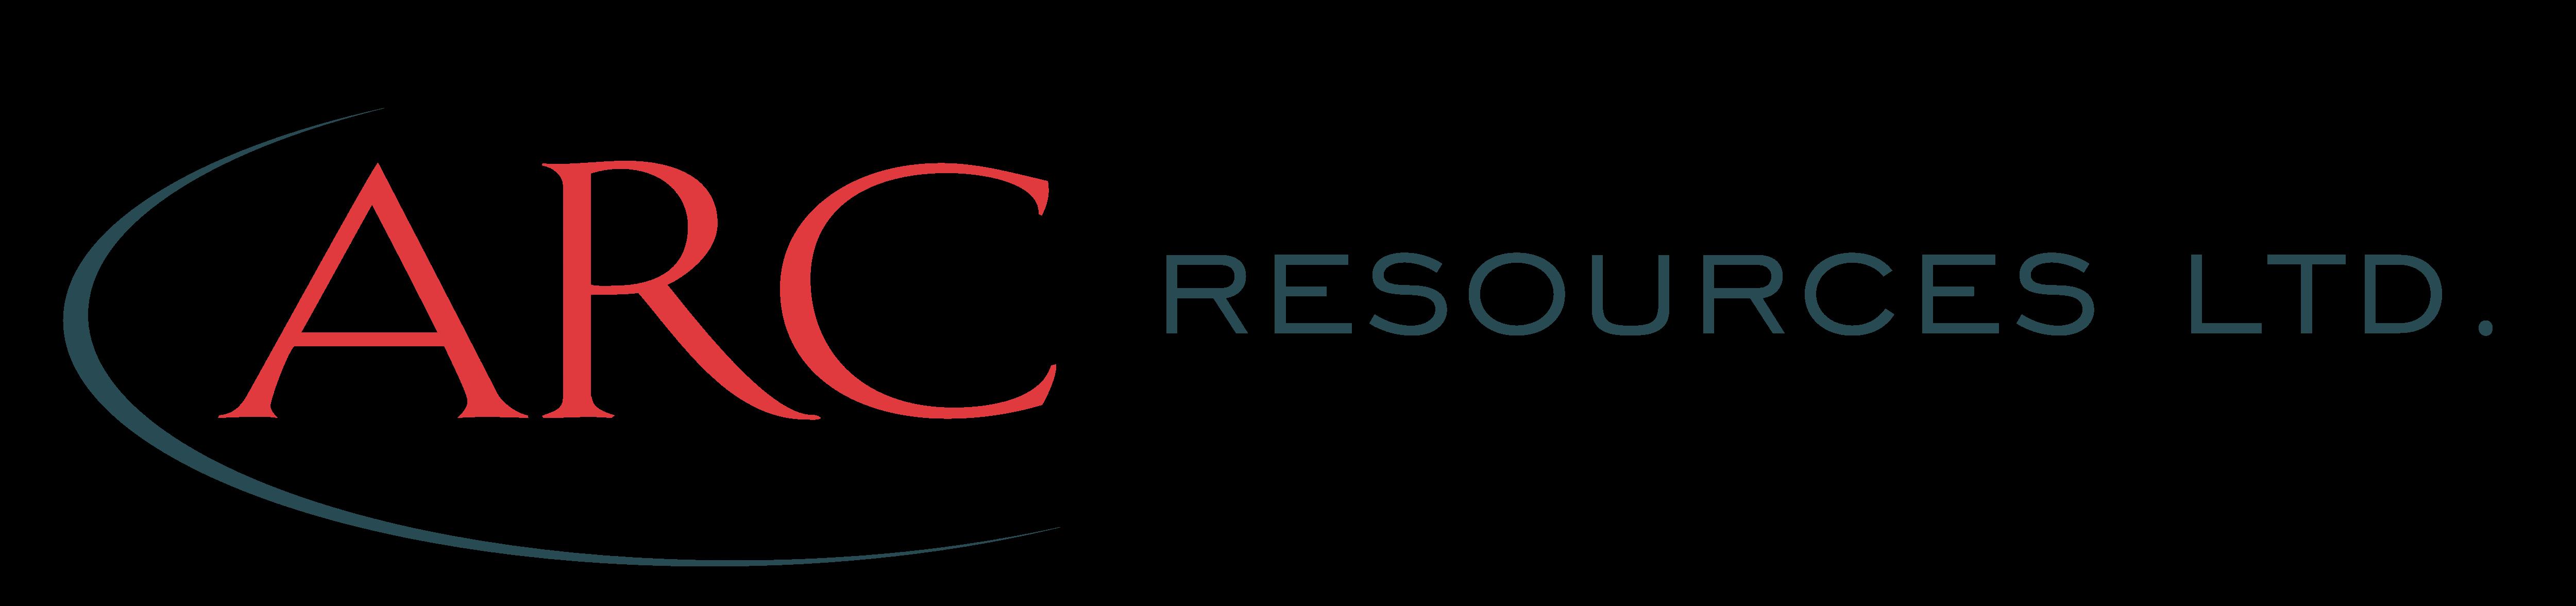 Arc Resources Logos Download